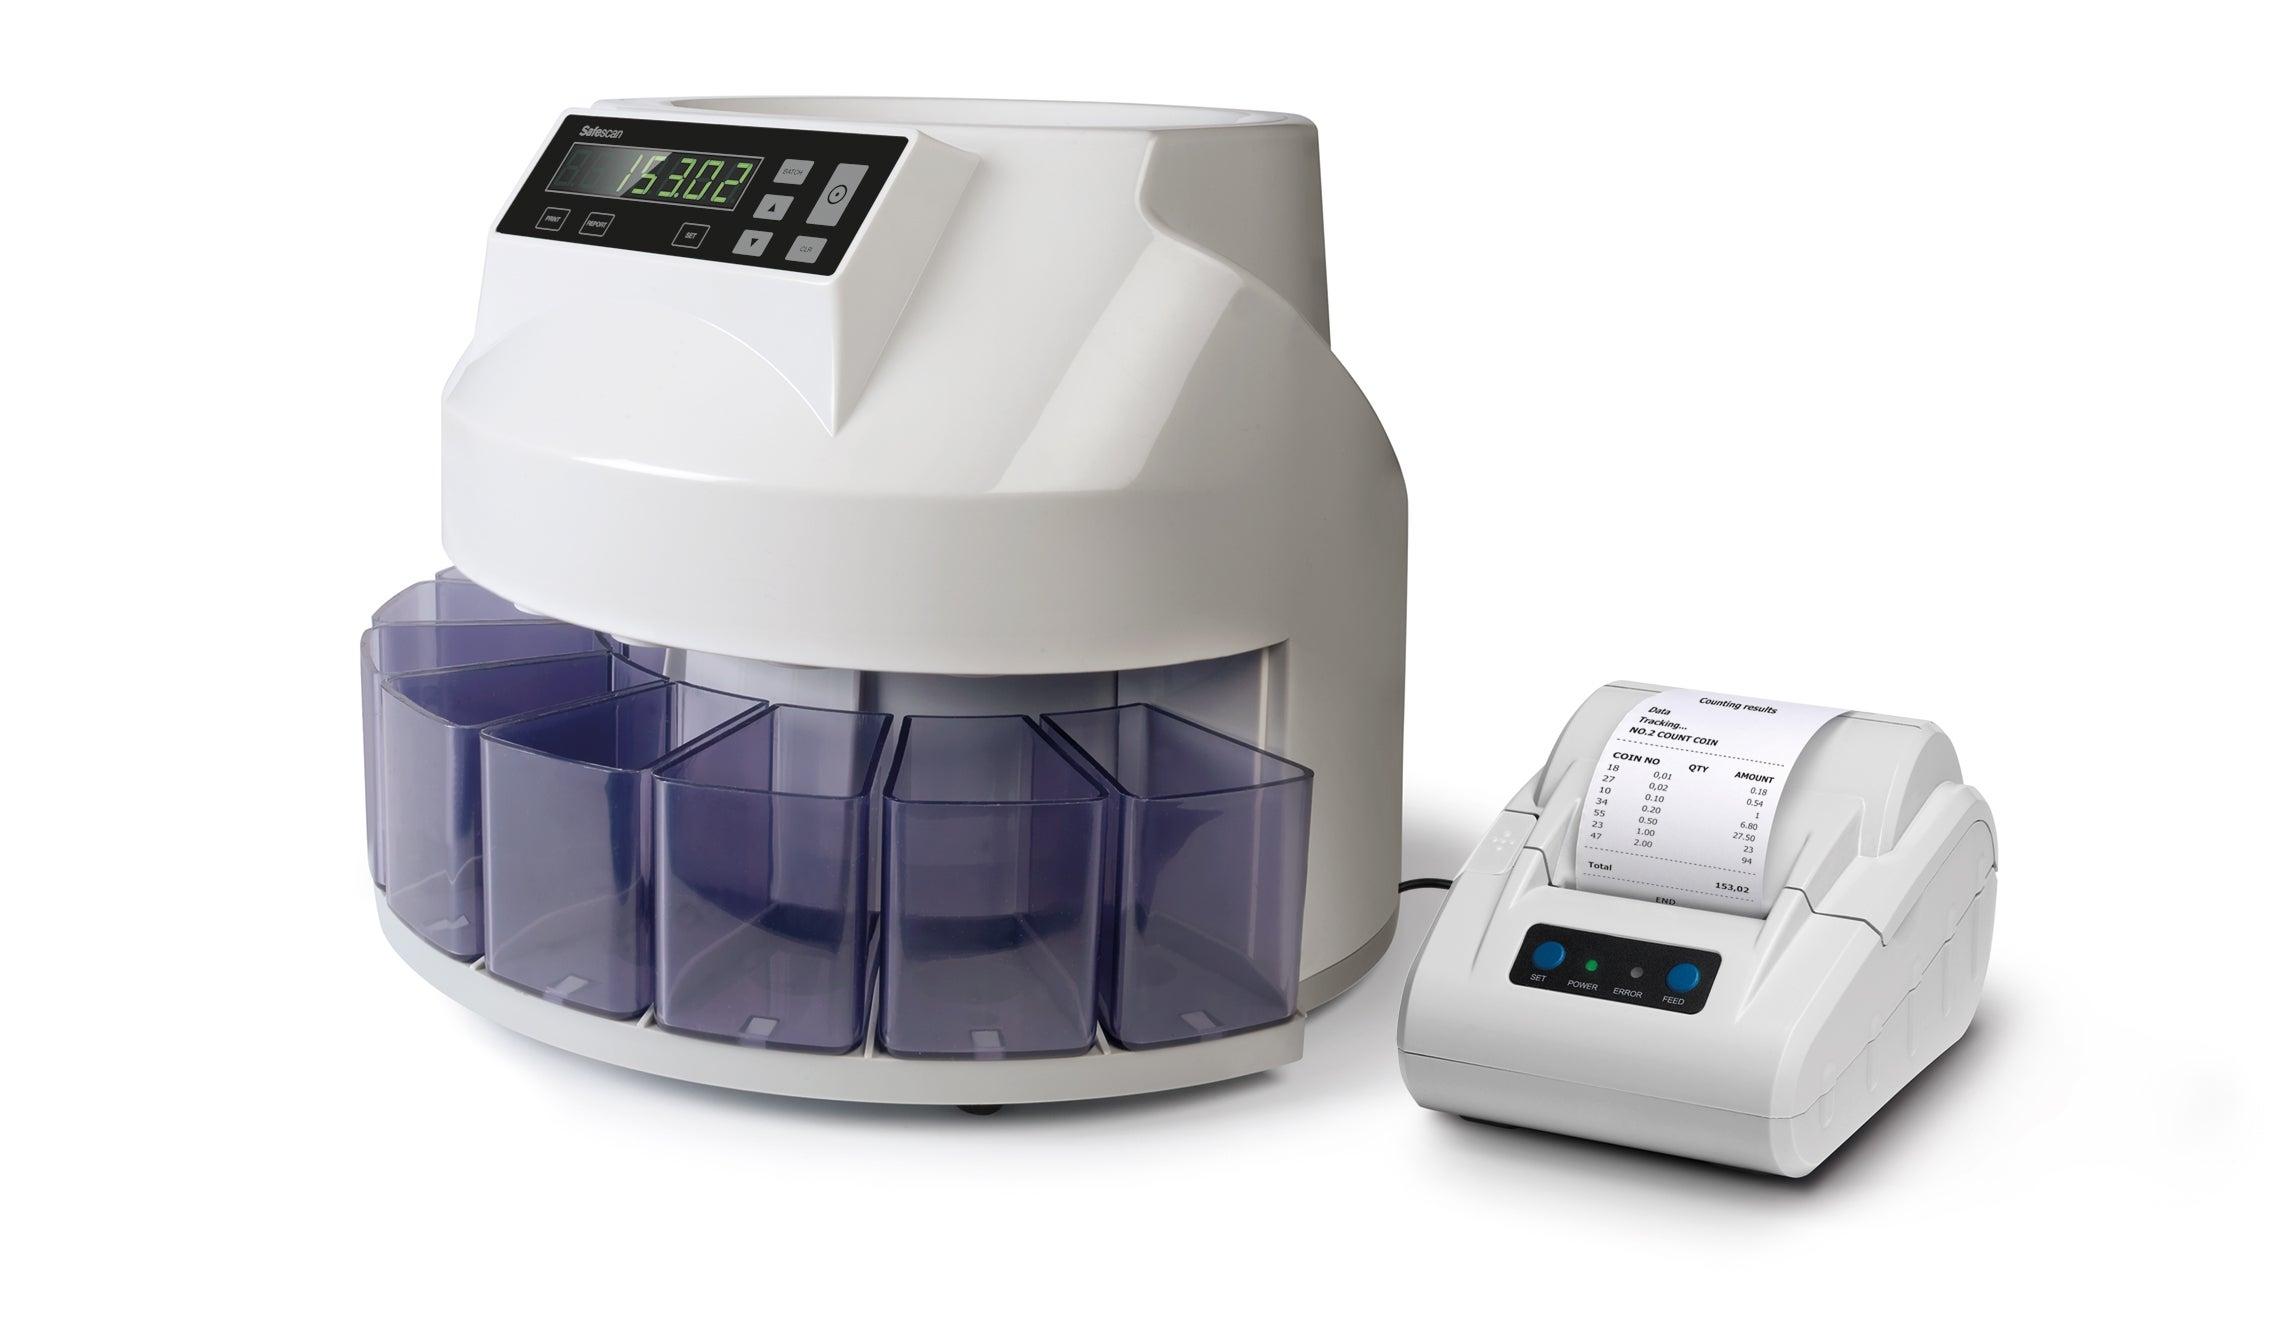 safescan-tp-230-with-safescan-1250